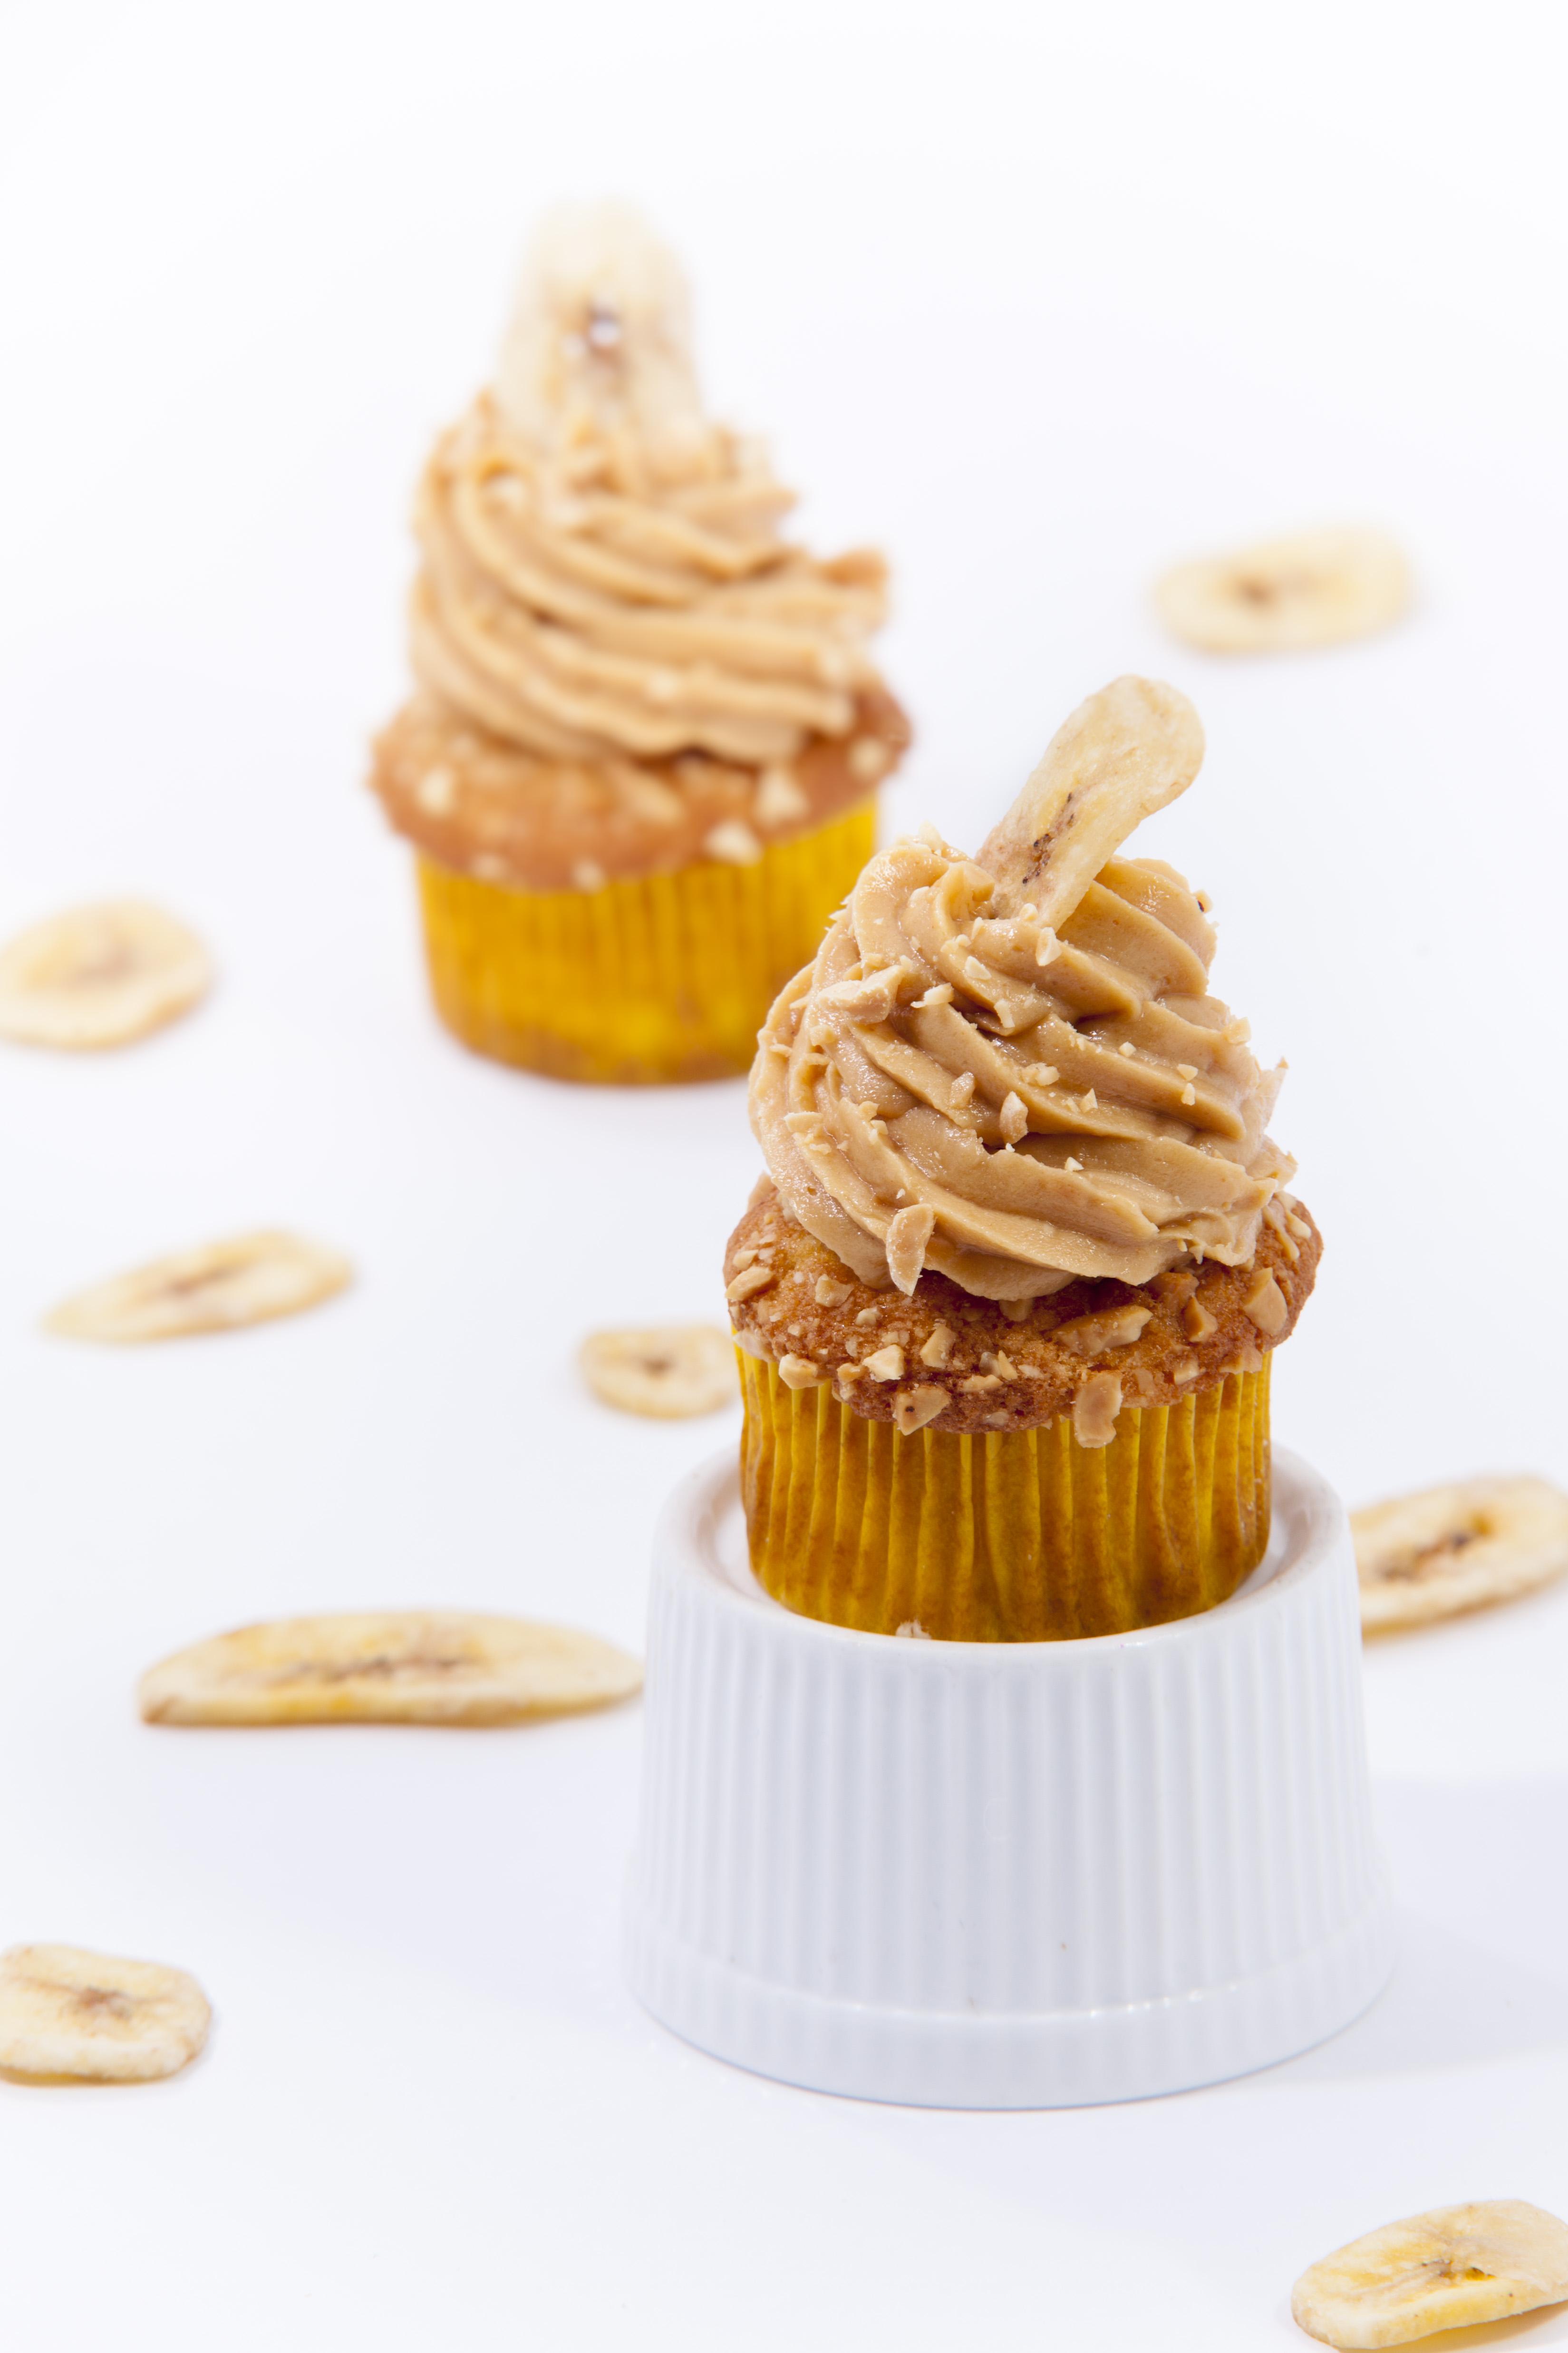 Fotografie receptu: Banánové cupcakes s arašídovým krémem